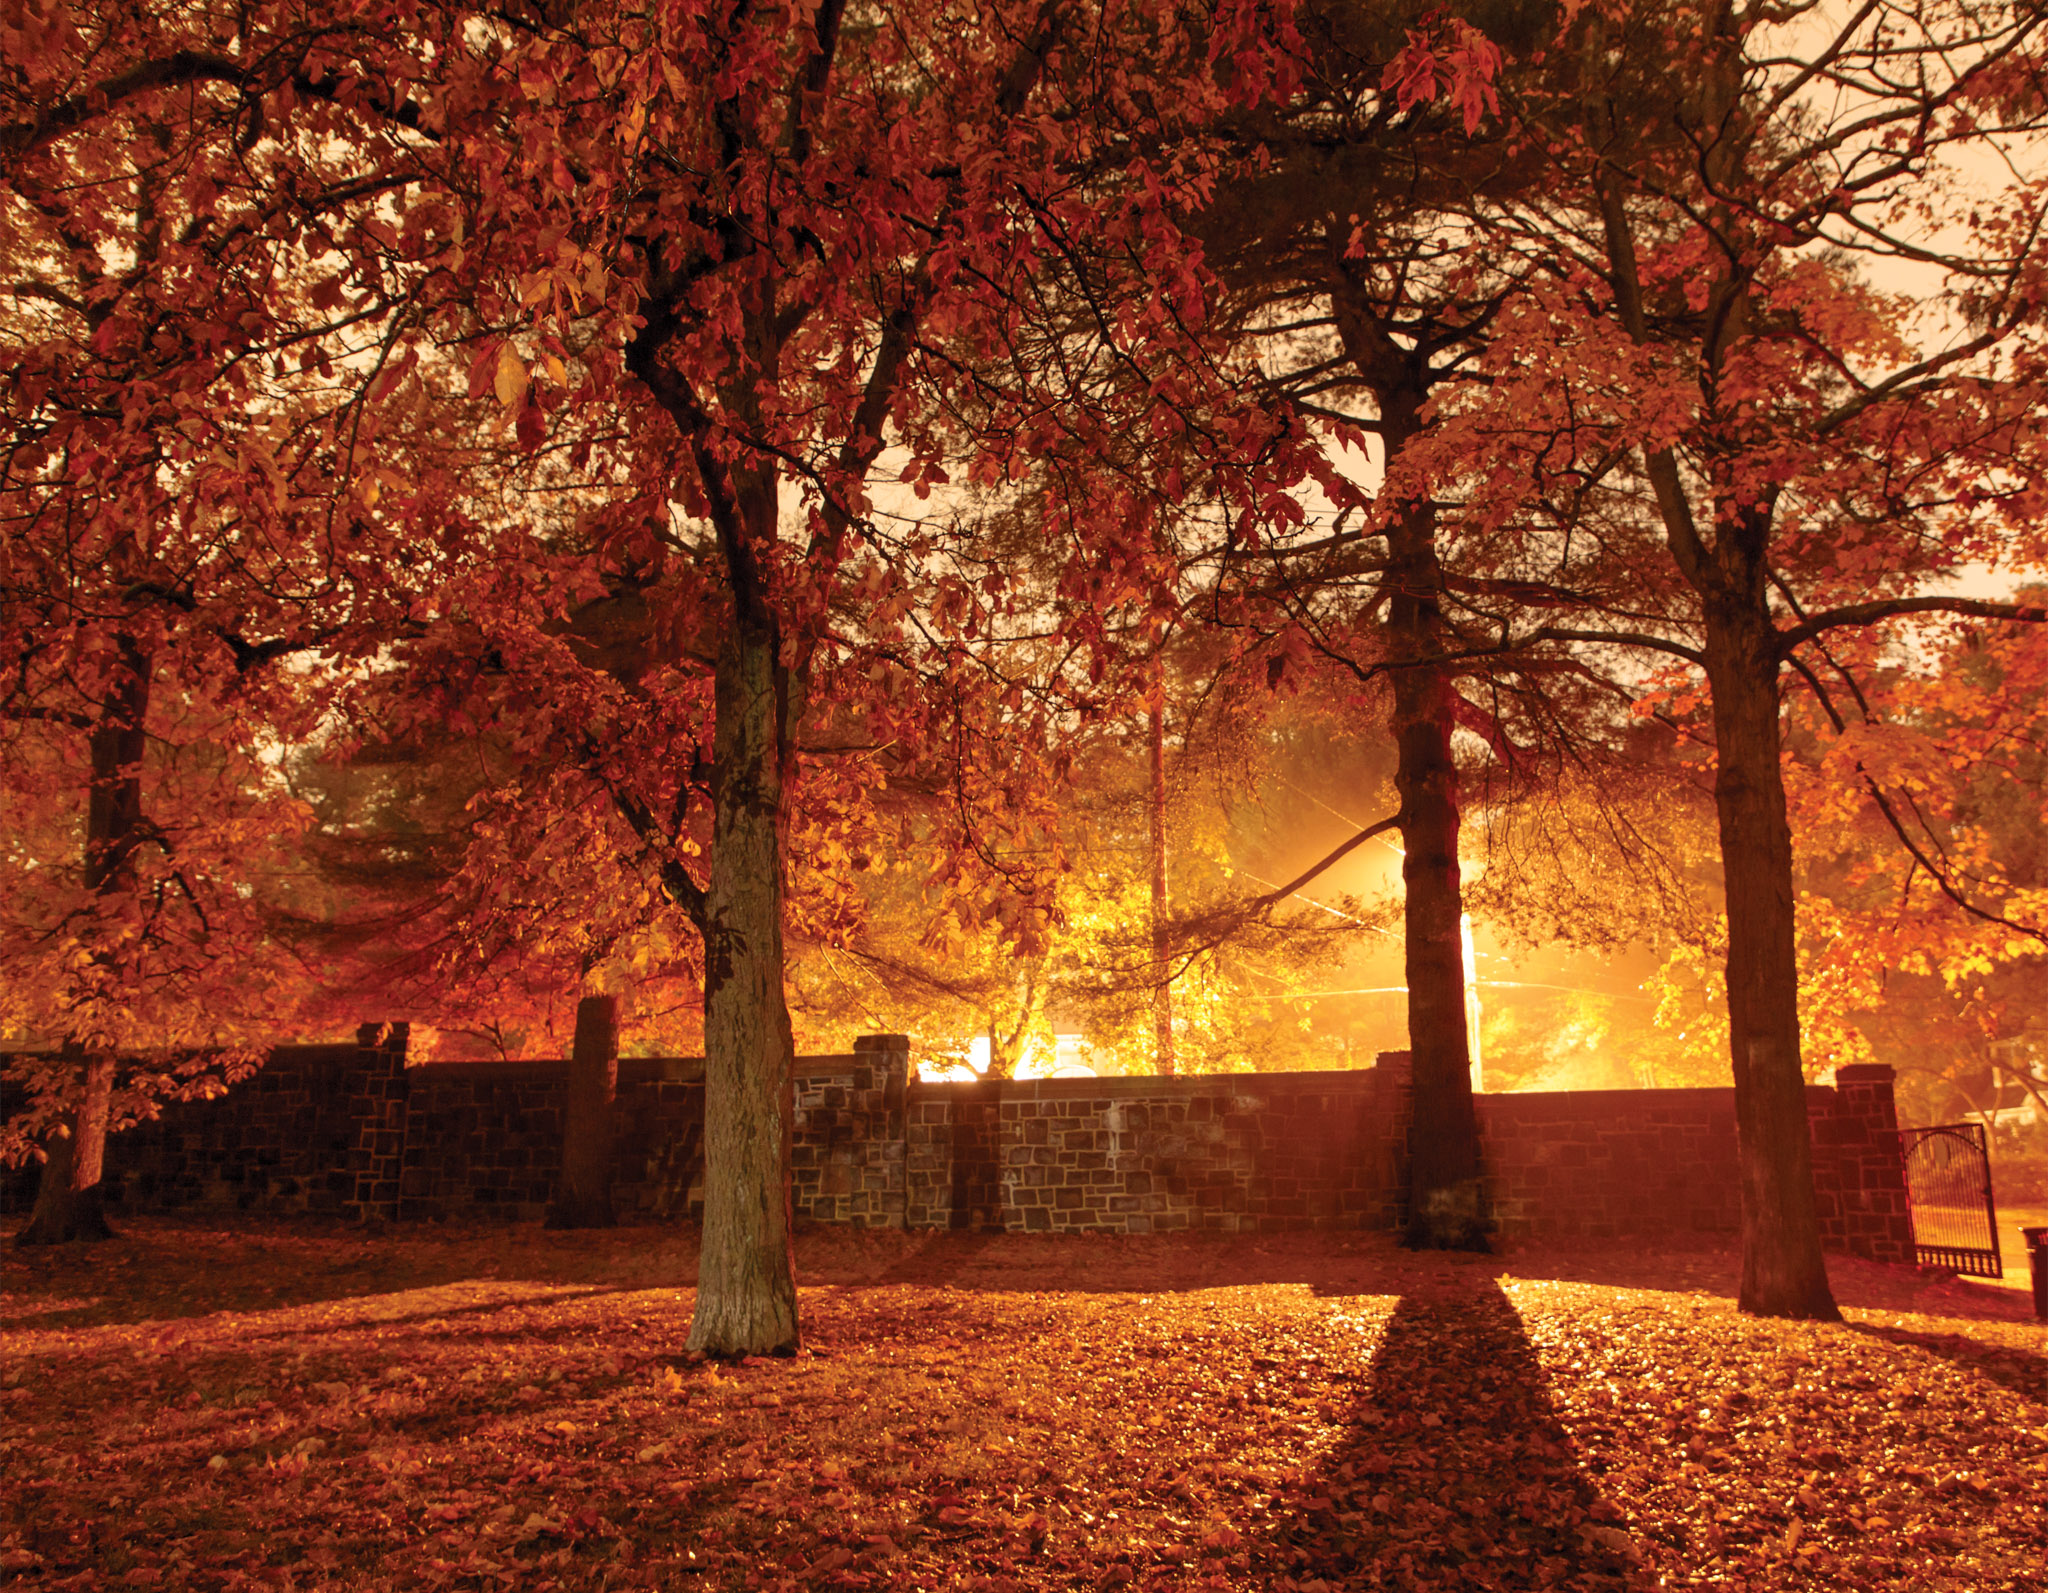 November: Edgerton Park